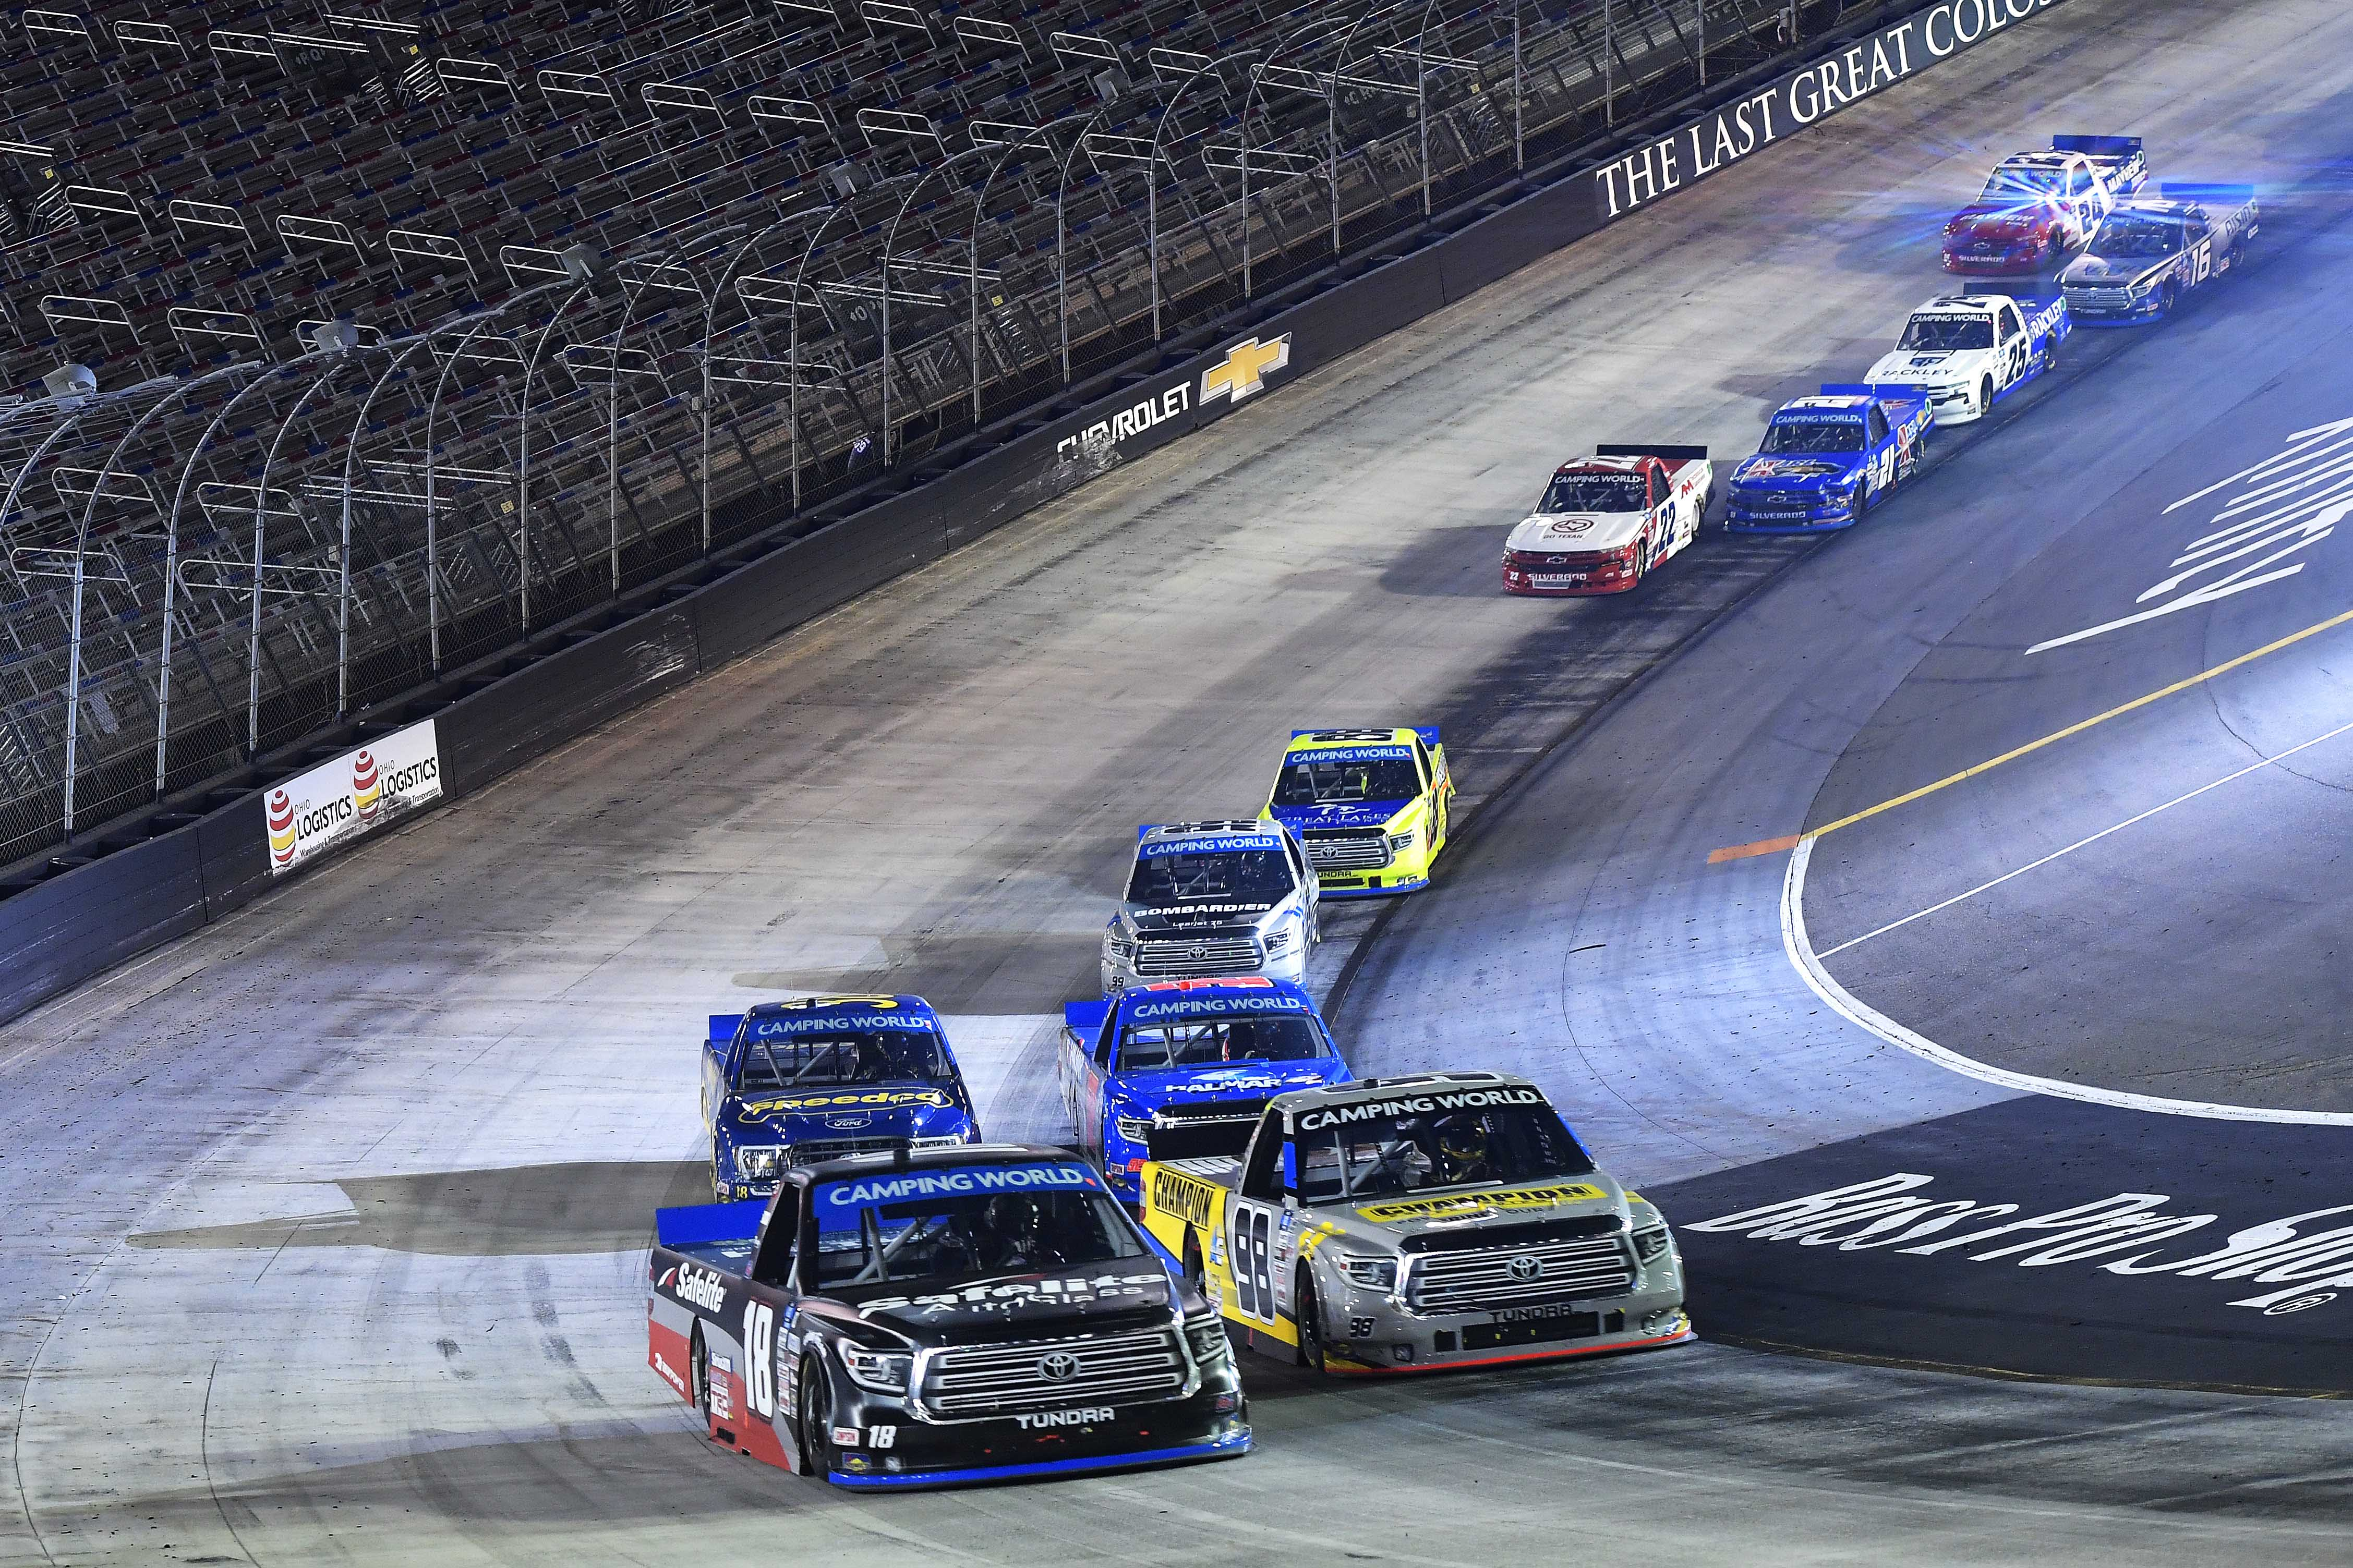 Chandler Smith, Grant Enfinger - Bristol Motor Speedway - NASCAR Truck Series